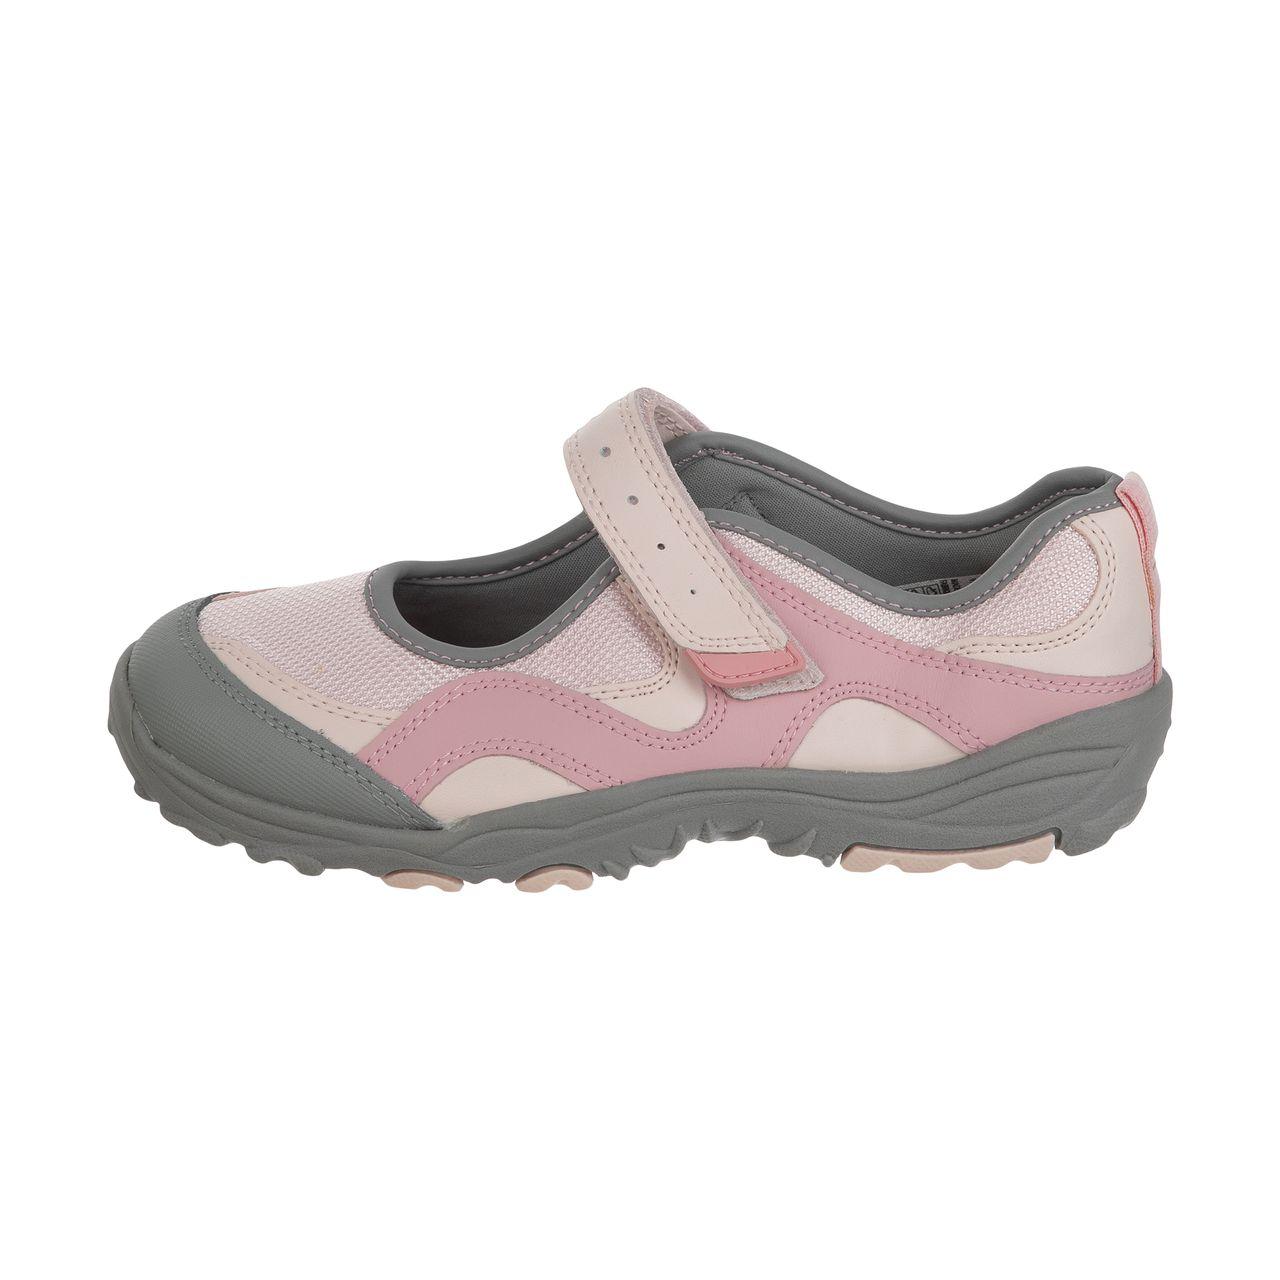 کفش راحتی دخترانه کد LE-01                     غیر اصل